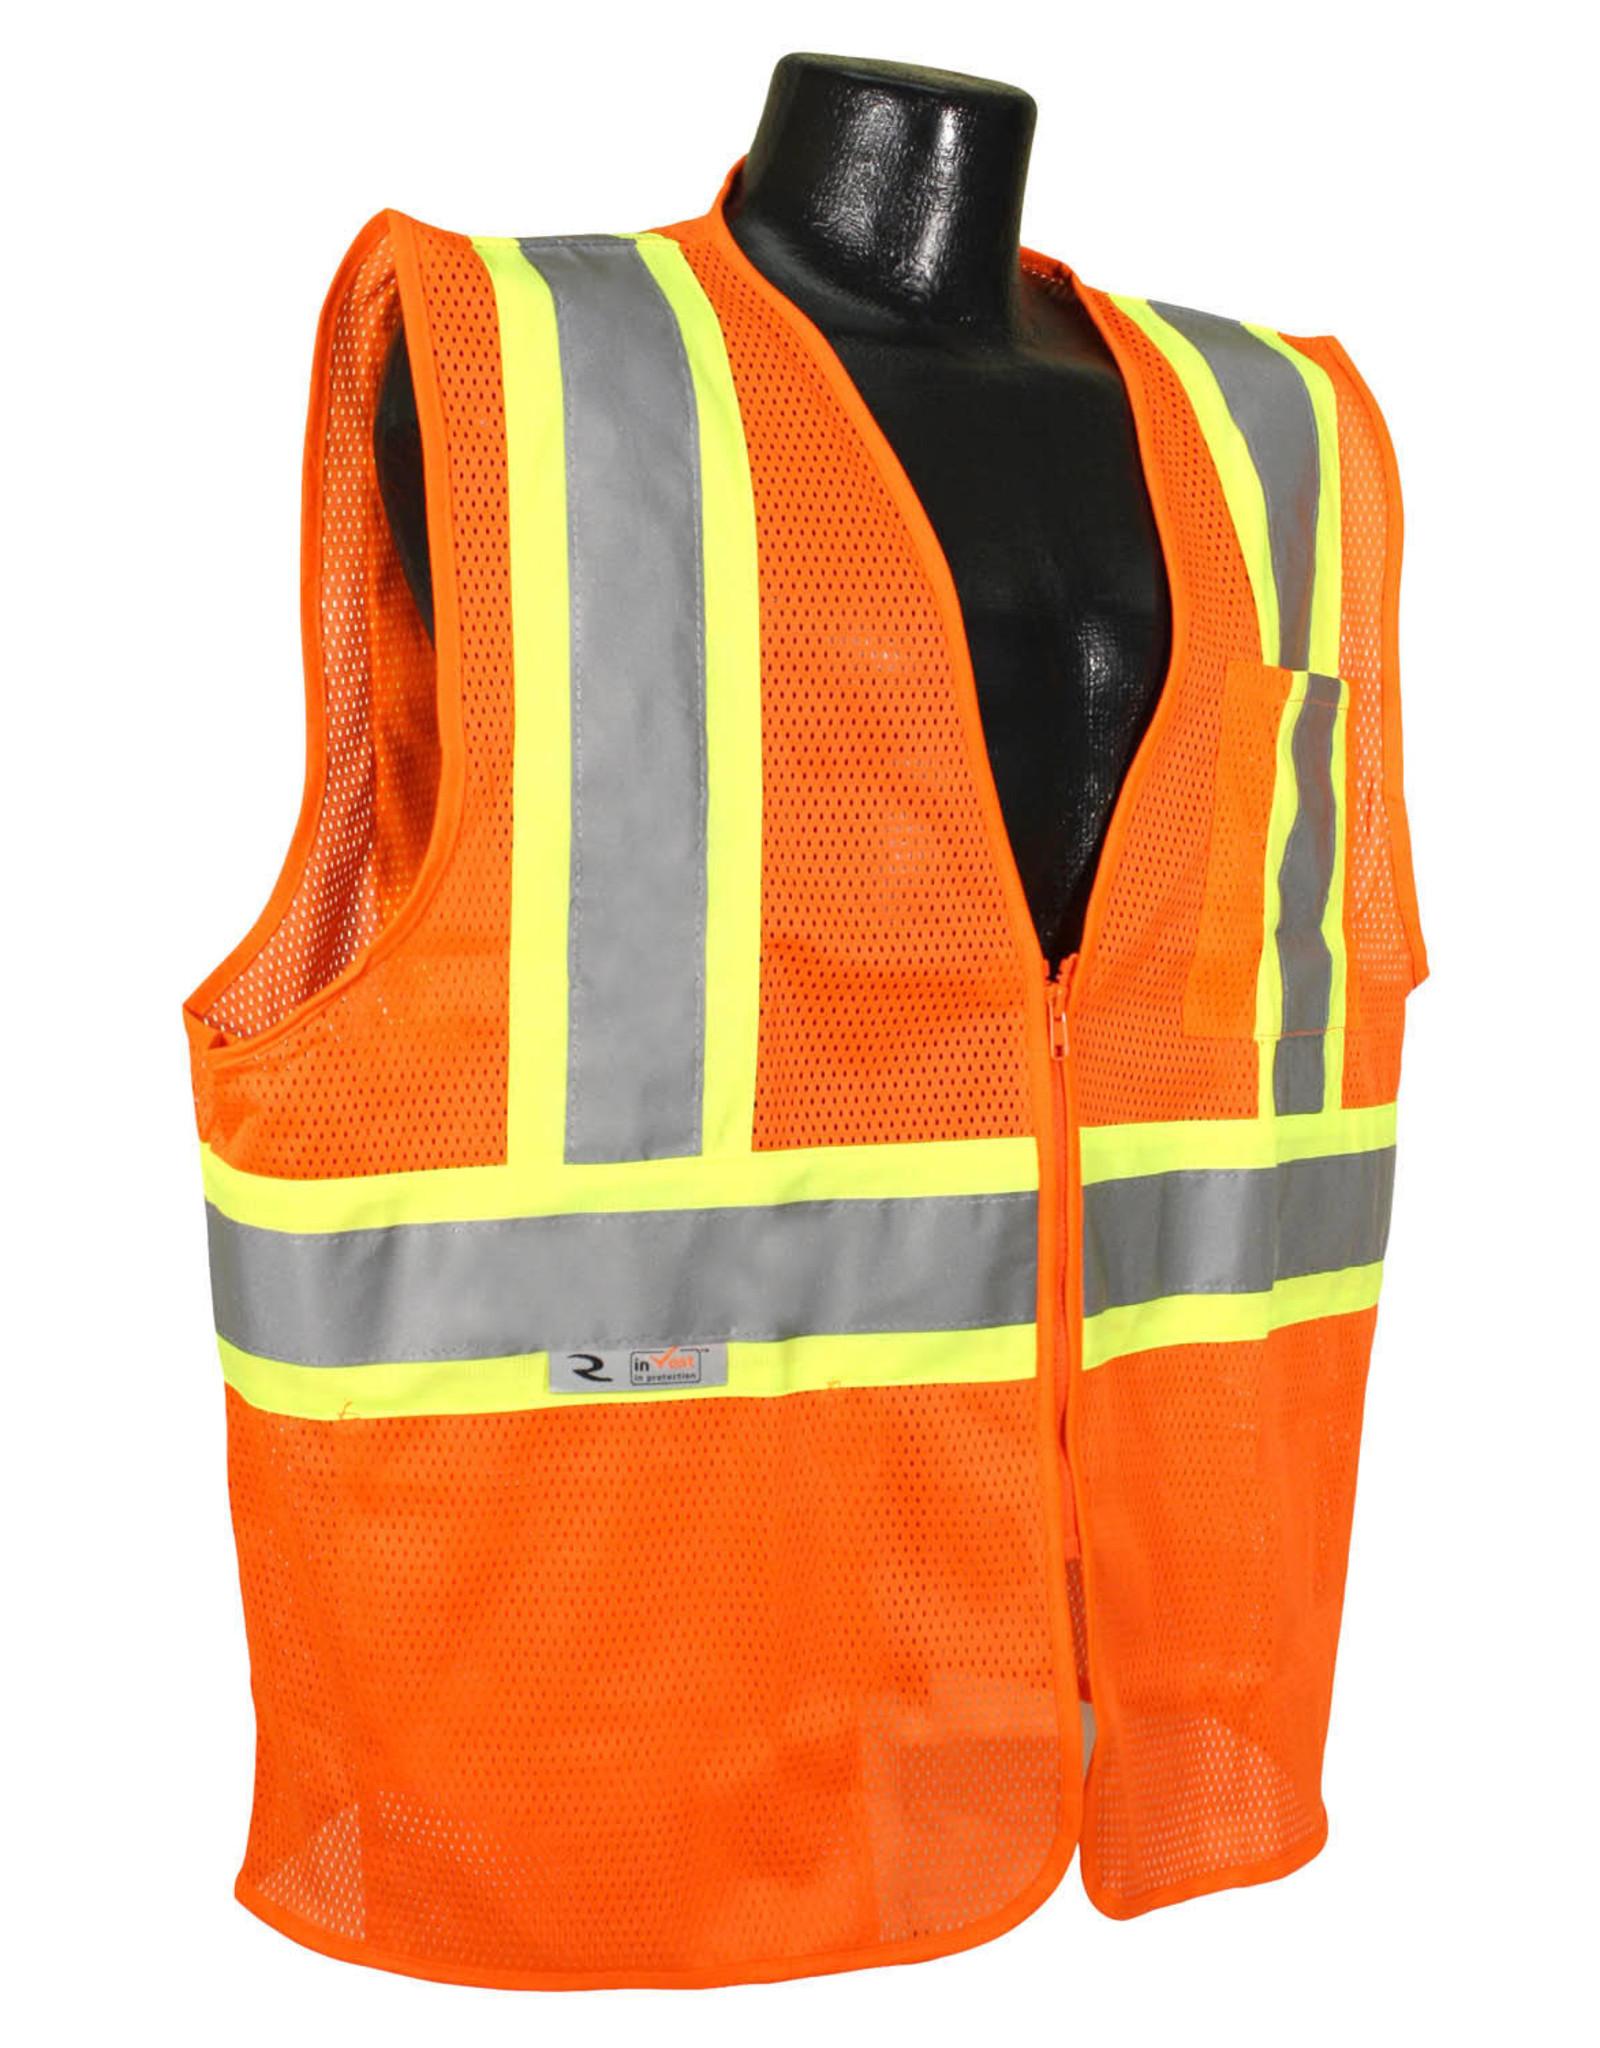 Safety Vest - Orange Mesh Class II, Reflective Tape, Various Sizes